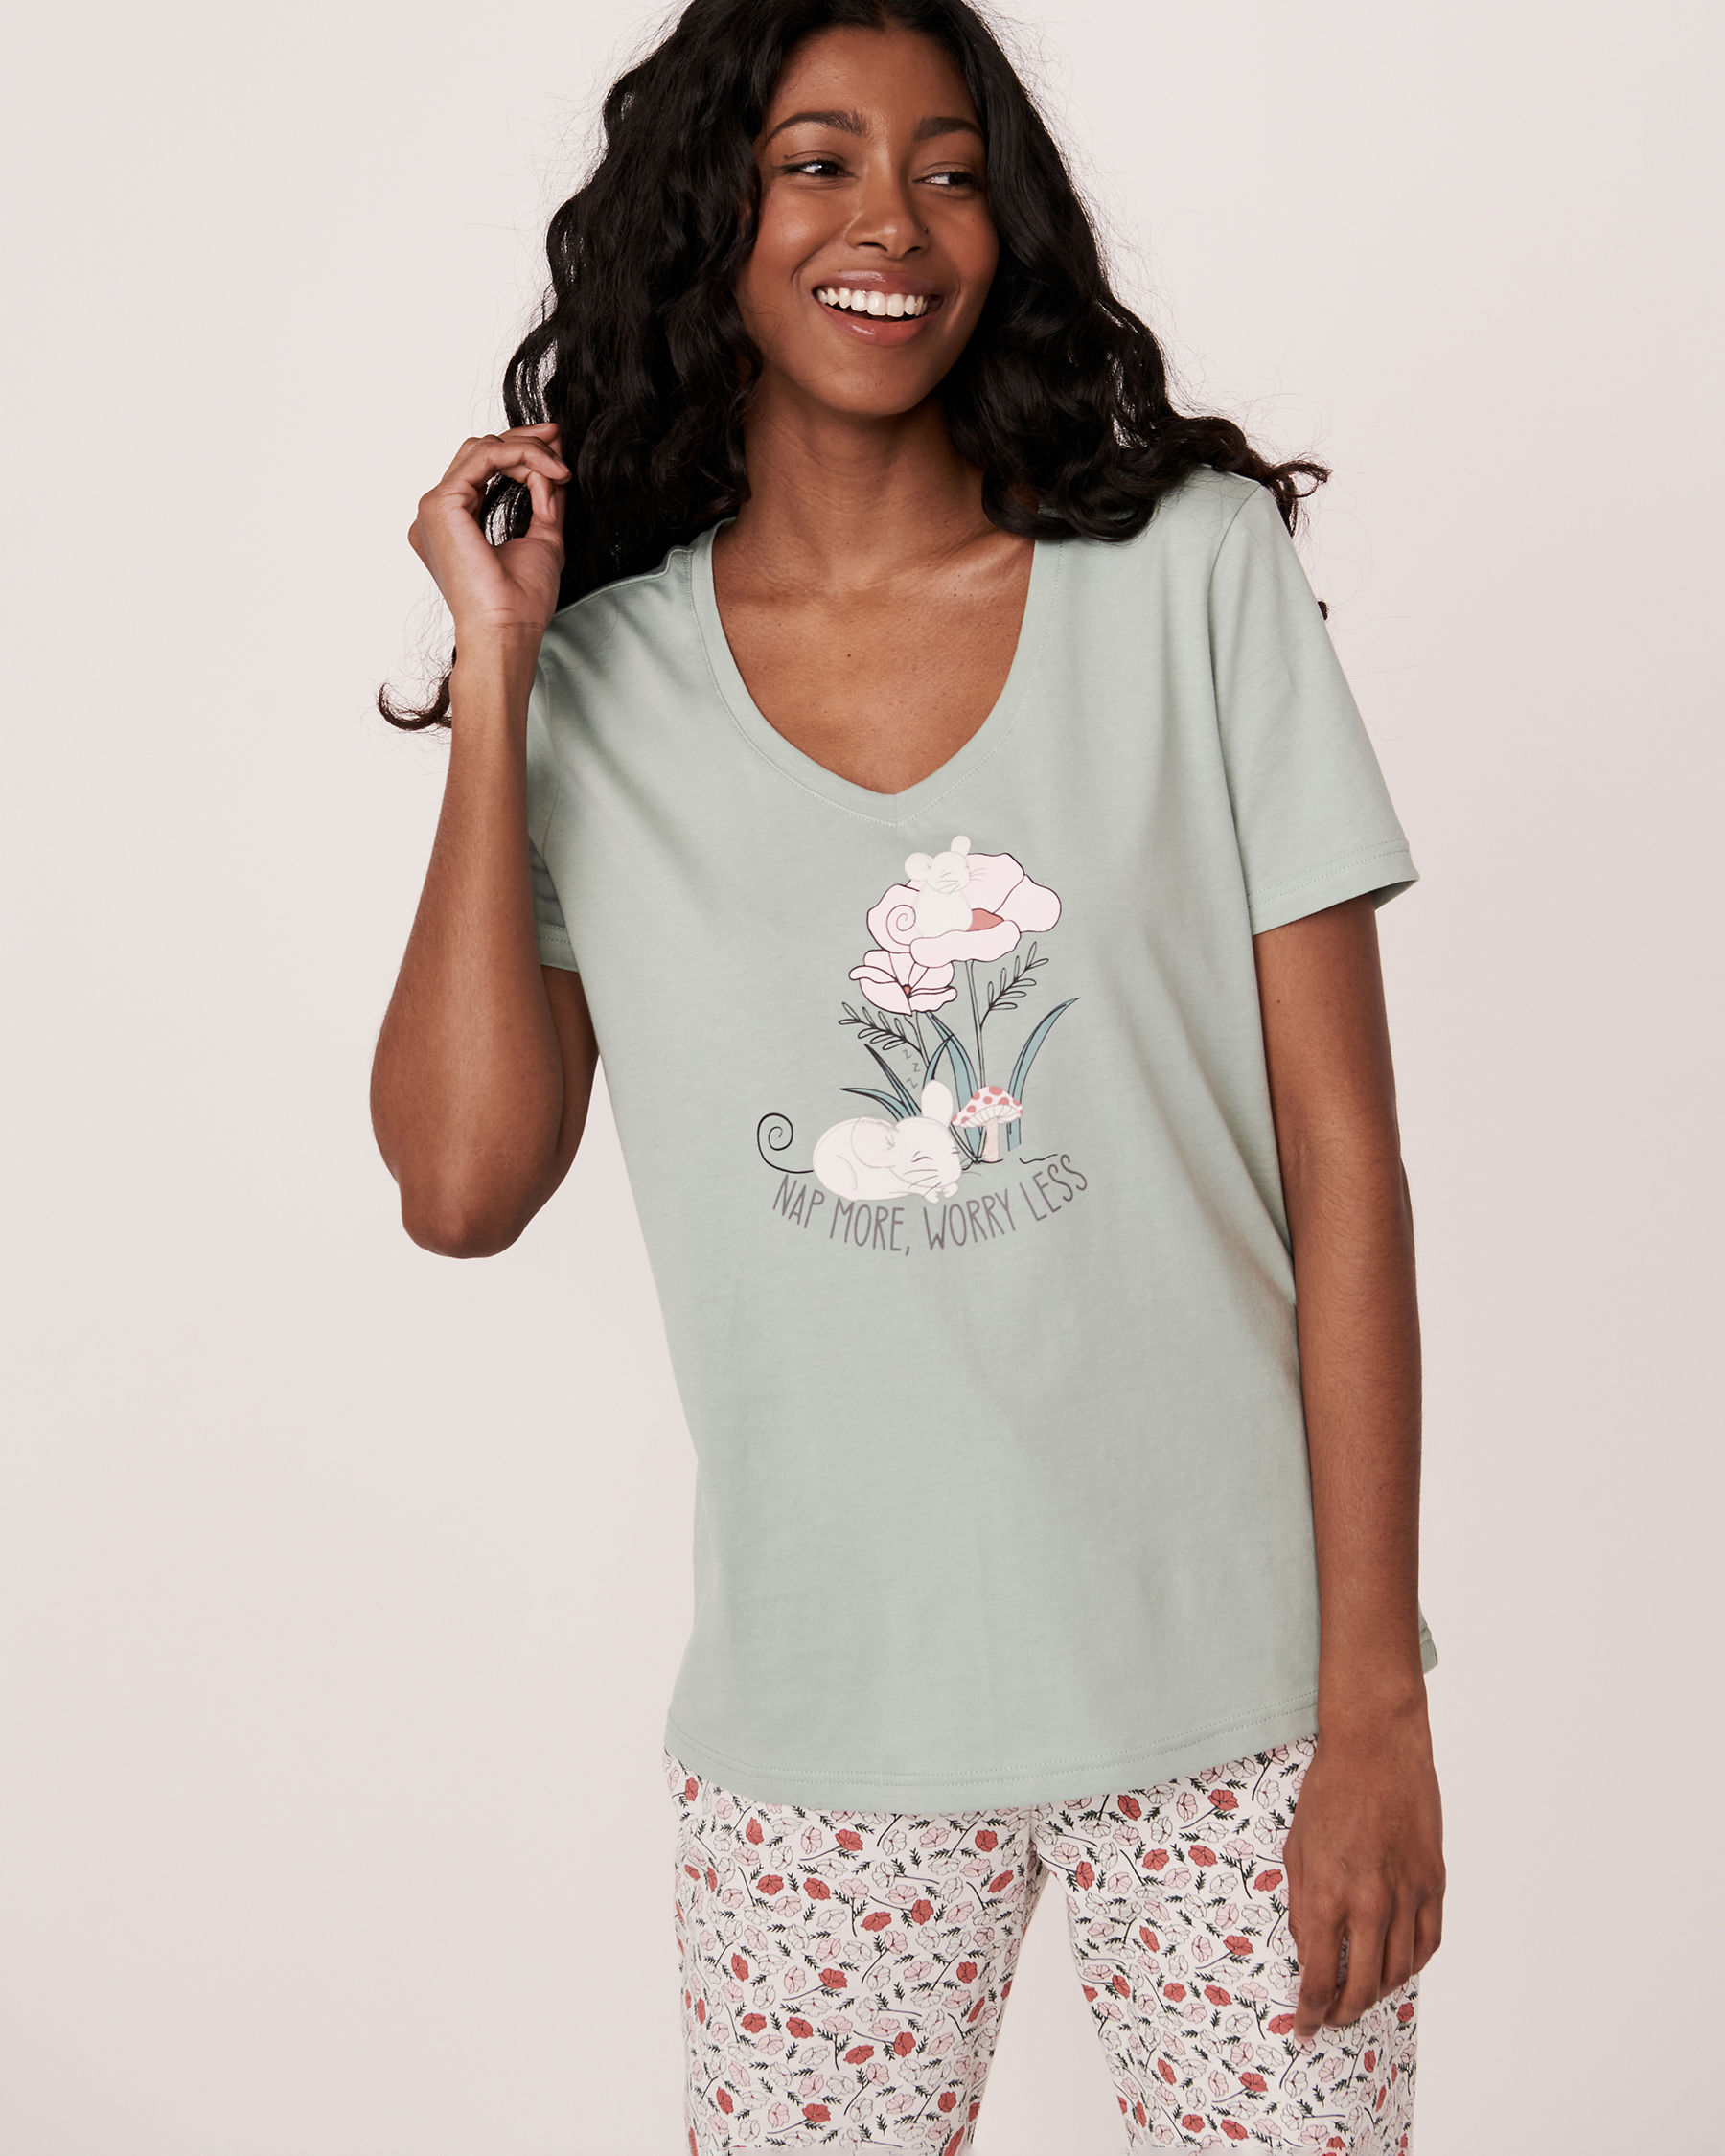 LA VIE EN ROSE V-neckline T-shirt Green 40100123 - View1